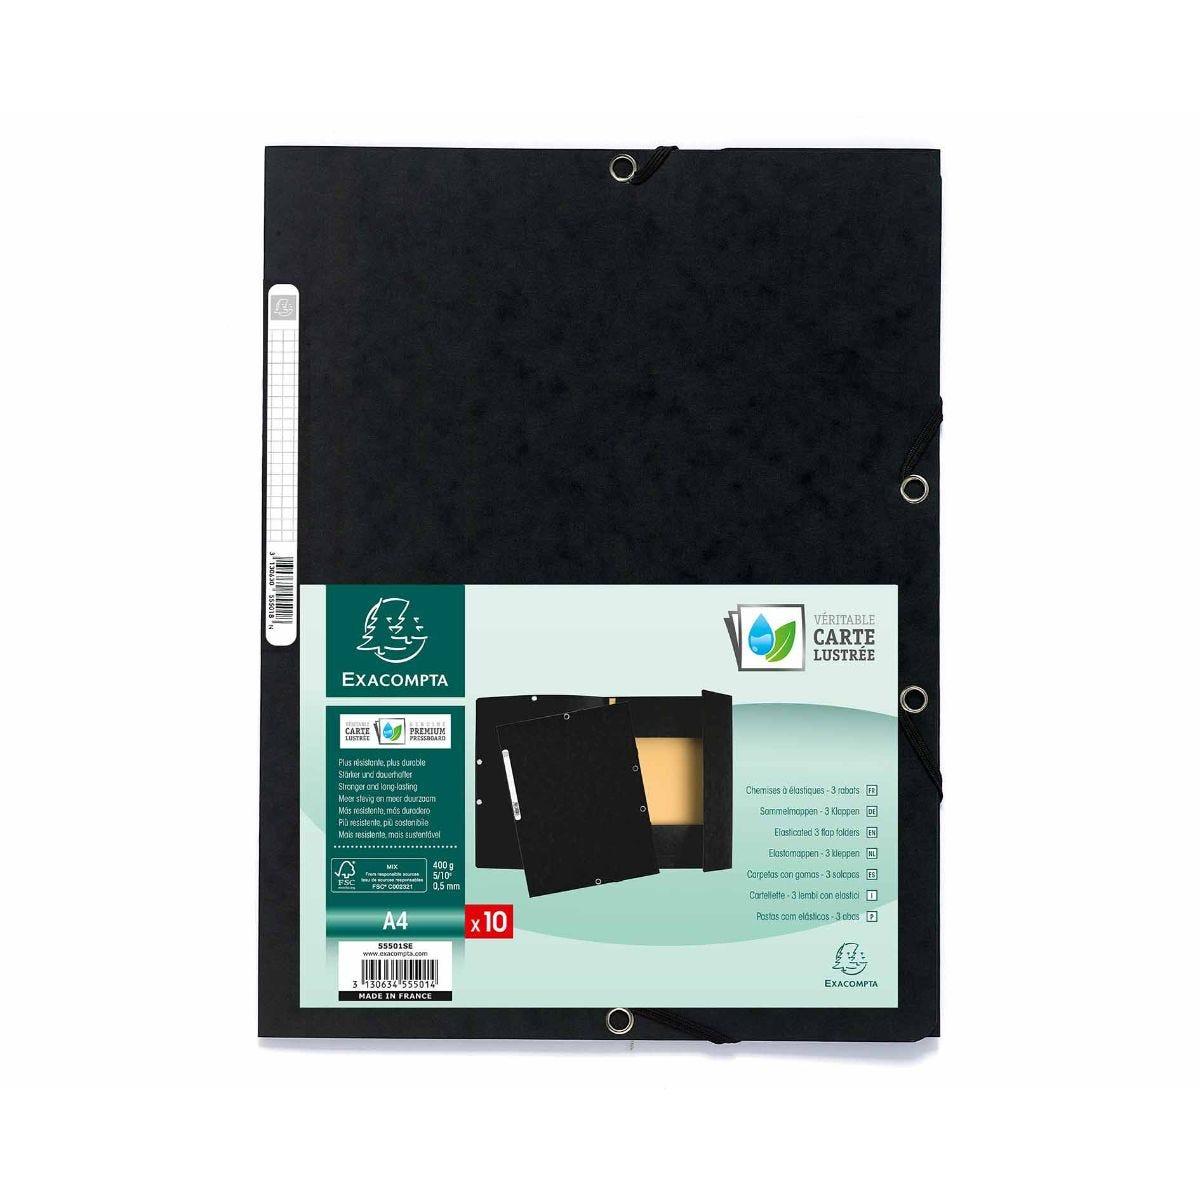 Exacompta Europa Elasticated 3 Flap Folder Yellow 400 gsm A4 Pack of 50